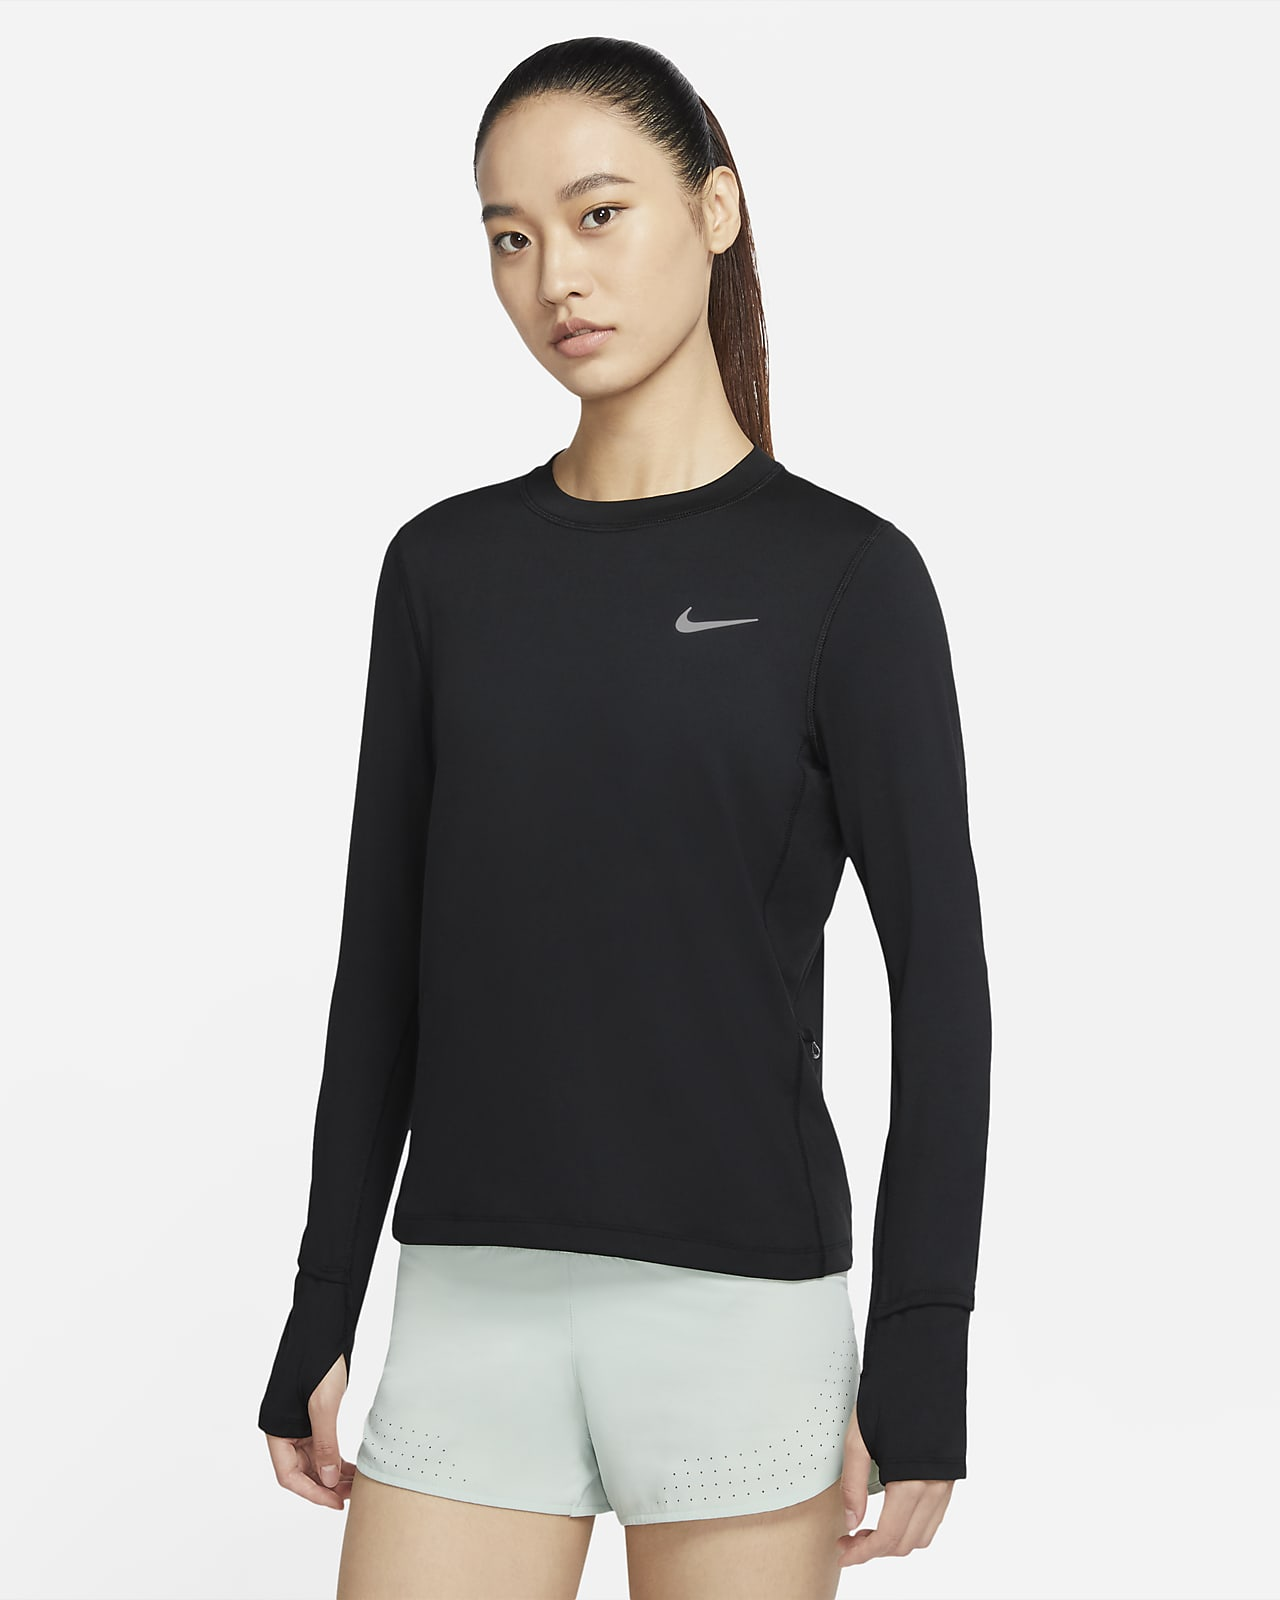 Nike 女子跑步圆领上衣